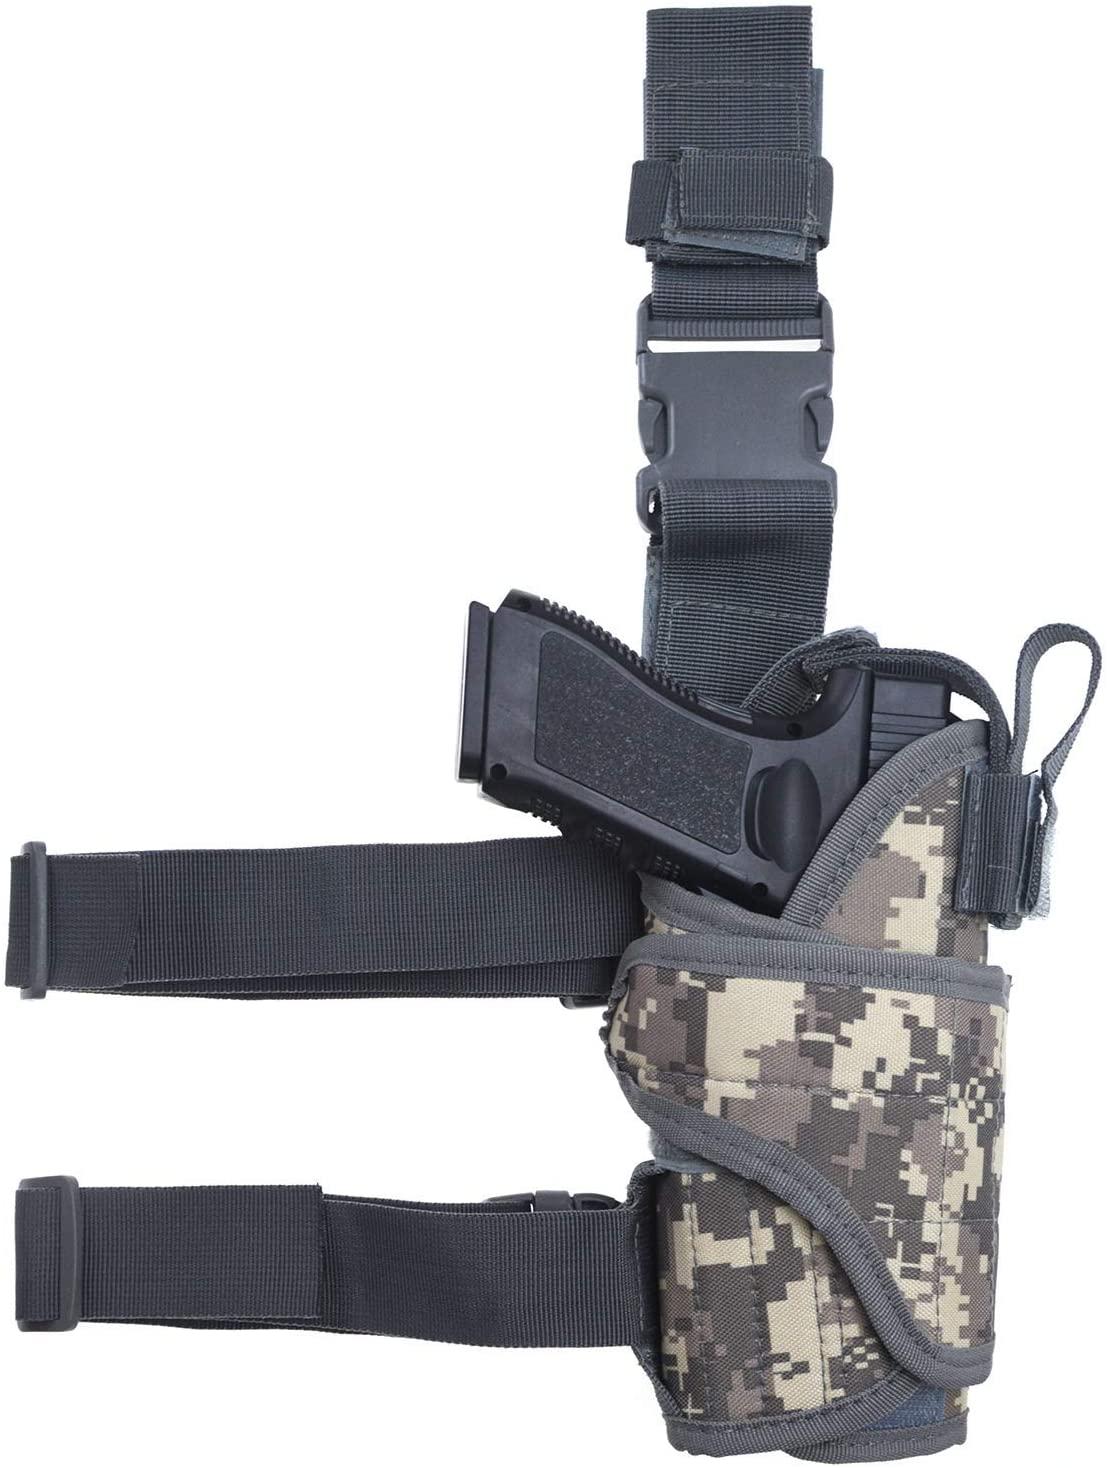 MUSVIKY Gun Leg Holster,Right-Handed Thigh Holster with Magazine Pouch,Universal Adjustable Tactical Pistol Gun Holster for Men Women,Upgraded Drop Leg Holster for Men and Women